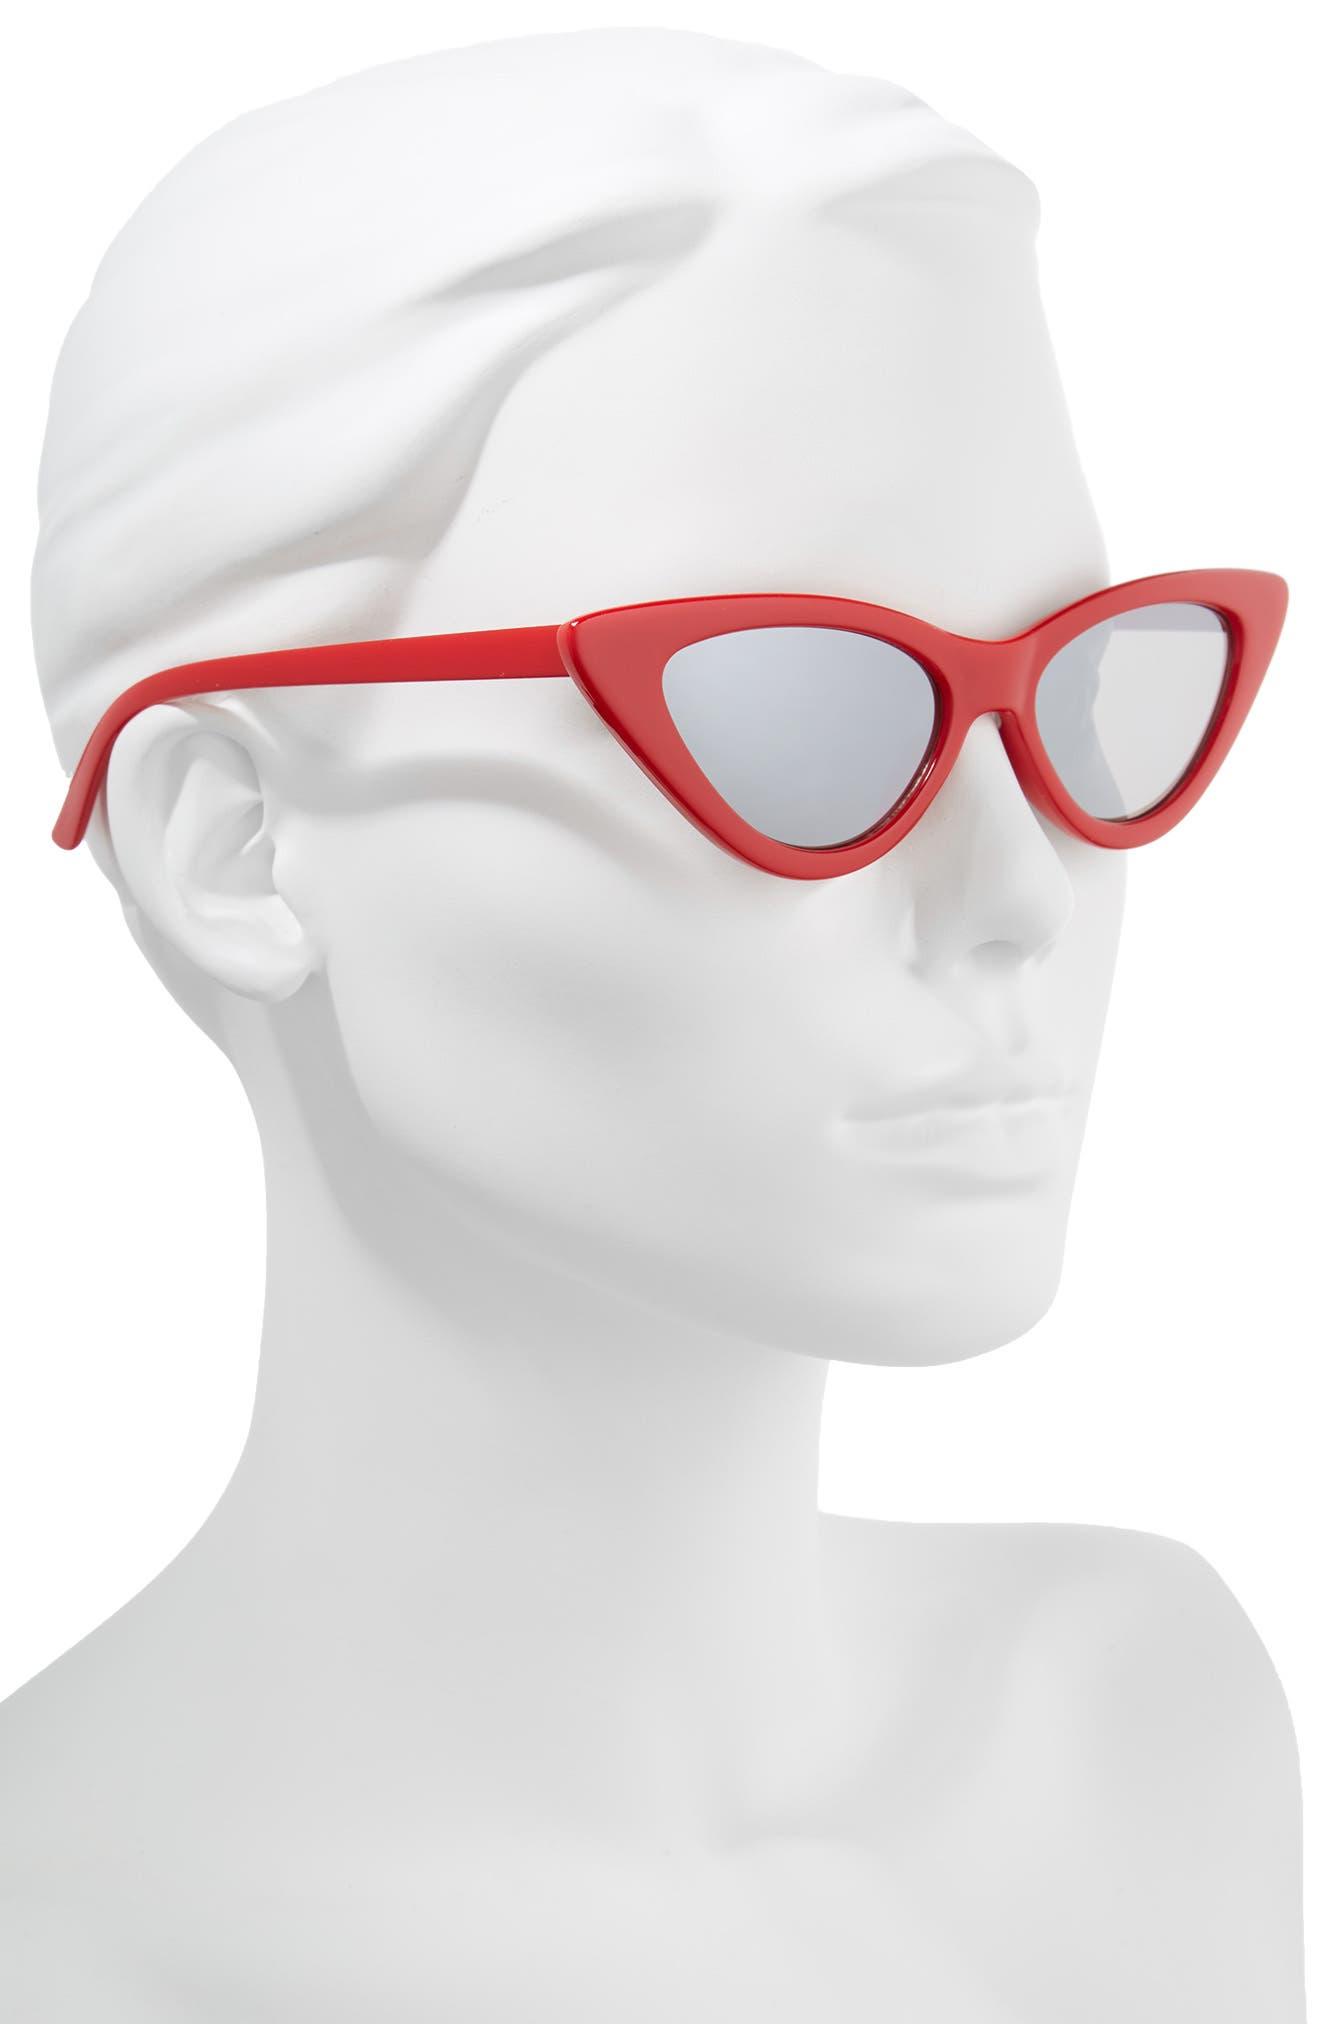 62mm Cat Eye Sunglasses,                             Alternate thumbnail 5, color,